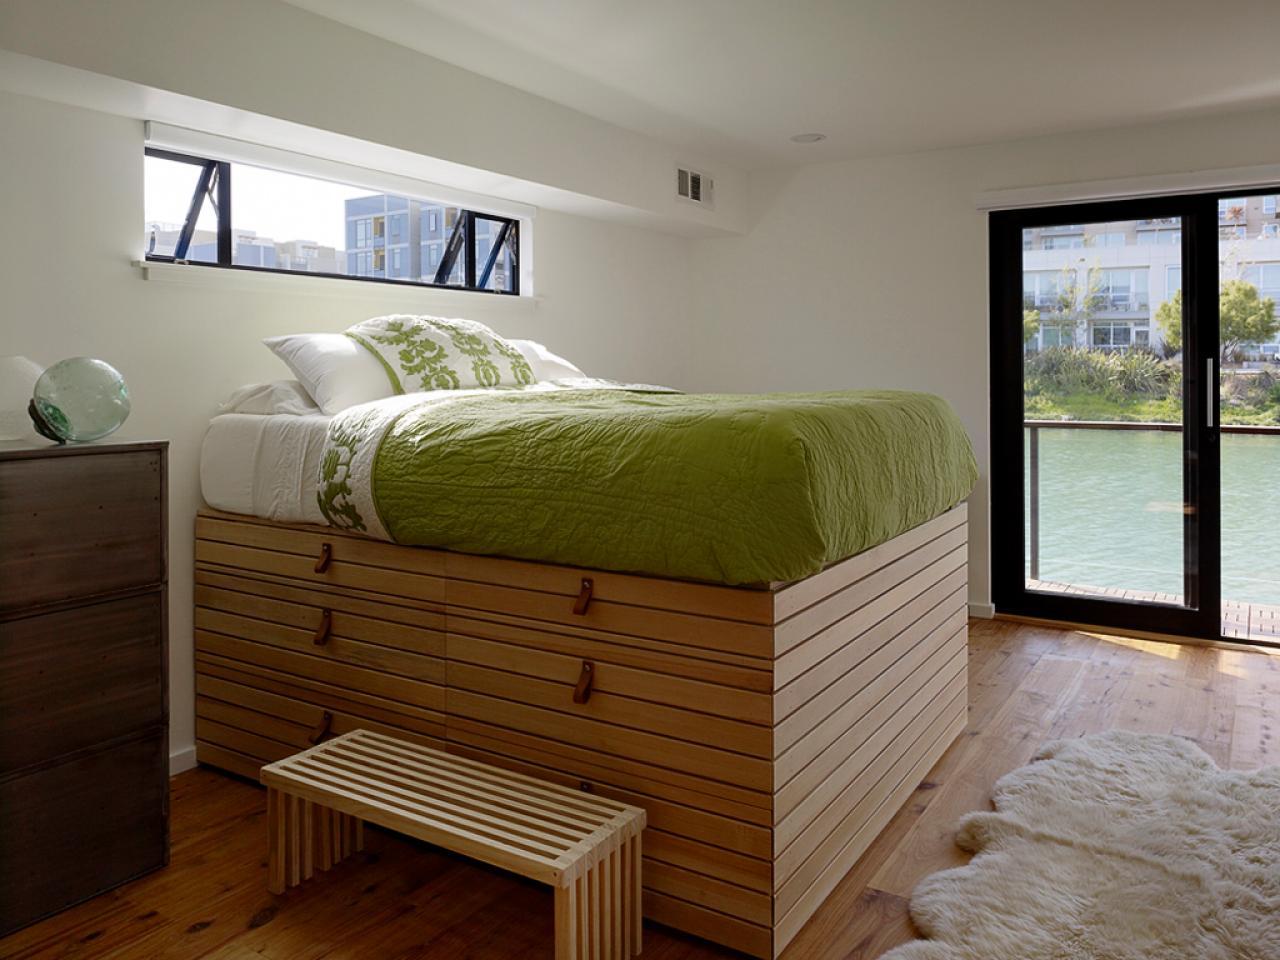 Alluring Pull Up Bed Storage Of High Platform Acnn Decor